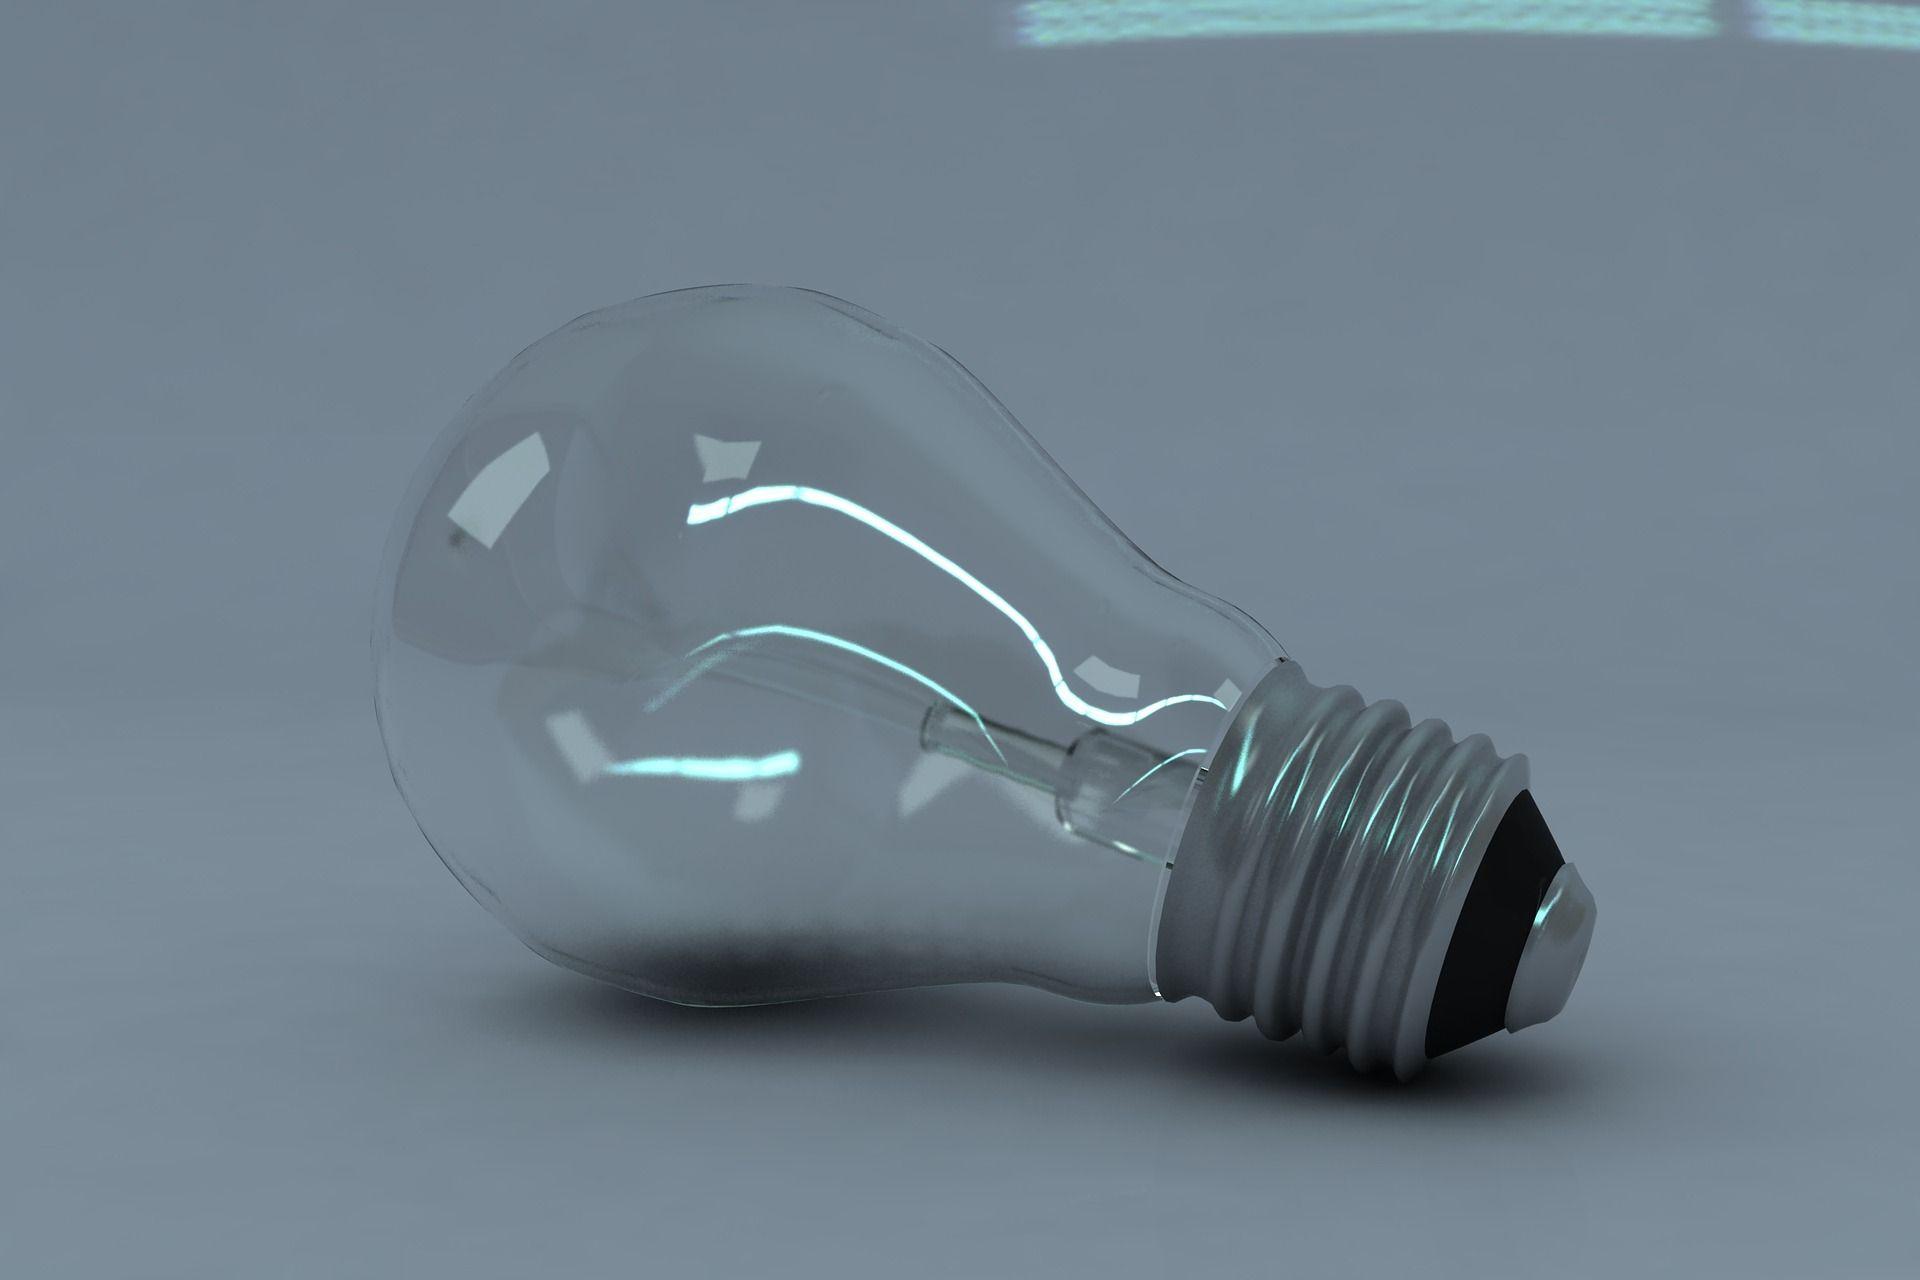 How To Dispose Of Light Bulbs Bulb, Outdoor lighting